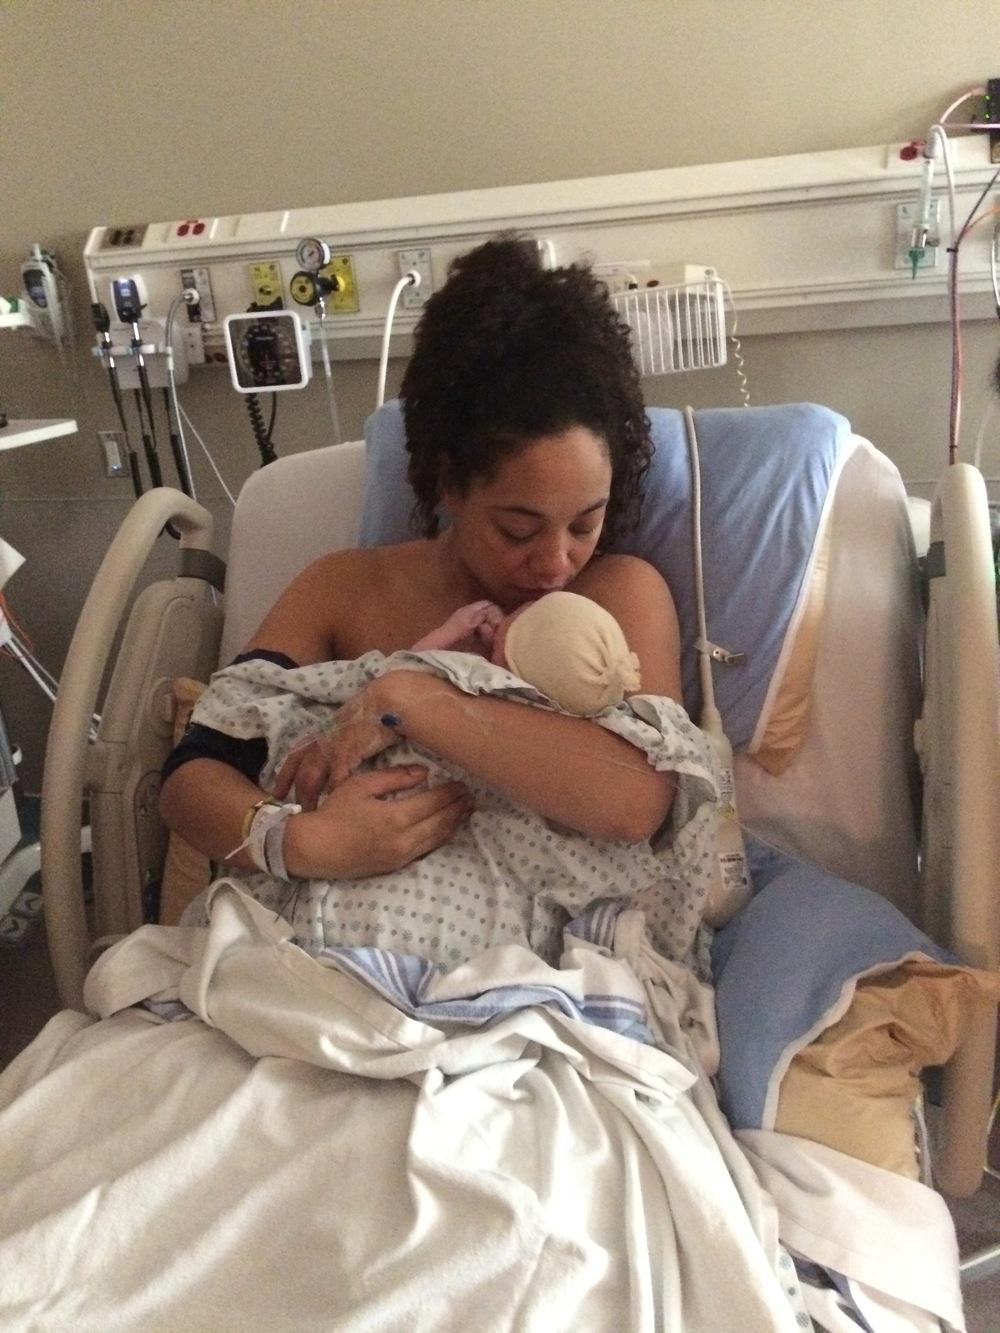 #PostpartumConfession | My Story: Jacalyn Scott #breastfeeding #anxiety #motherhood #birth